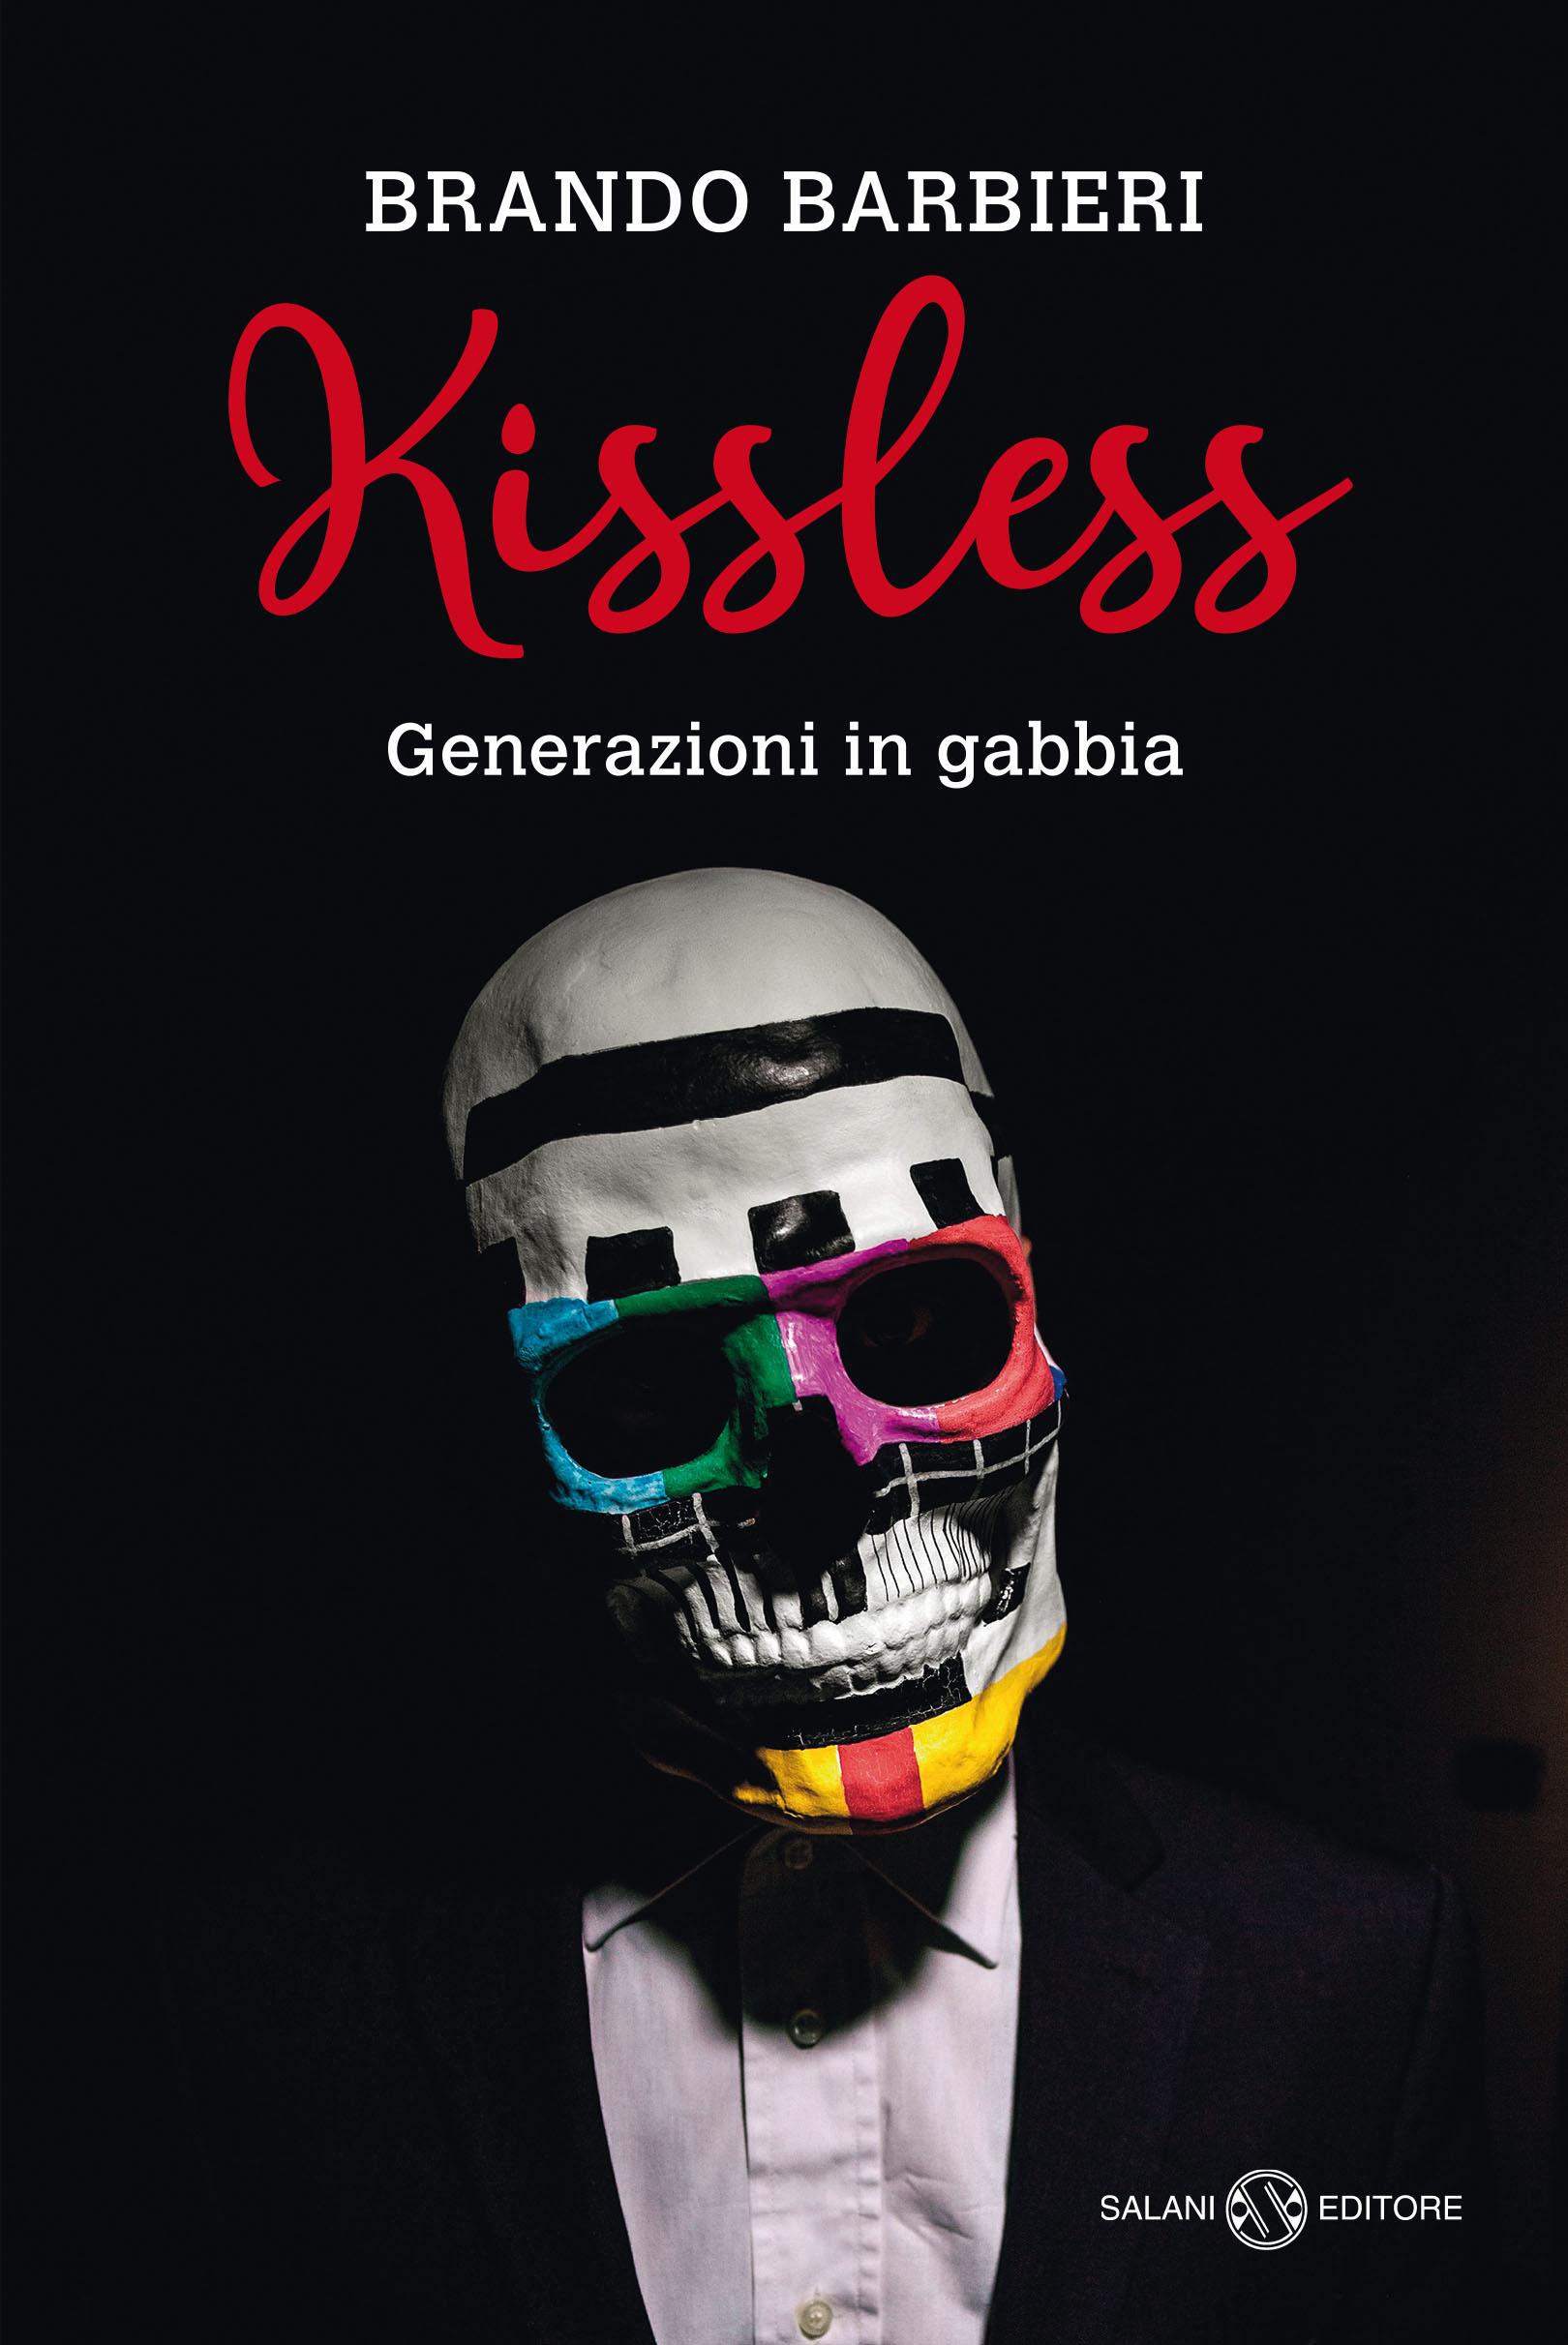 Kissless Brando Barbieri